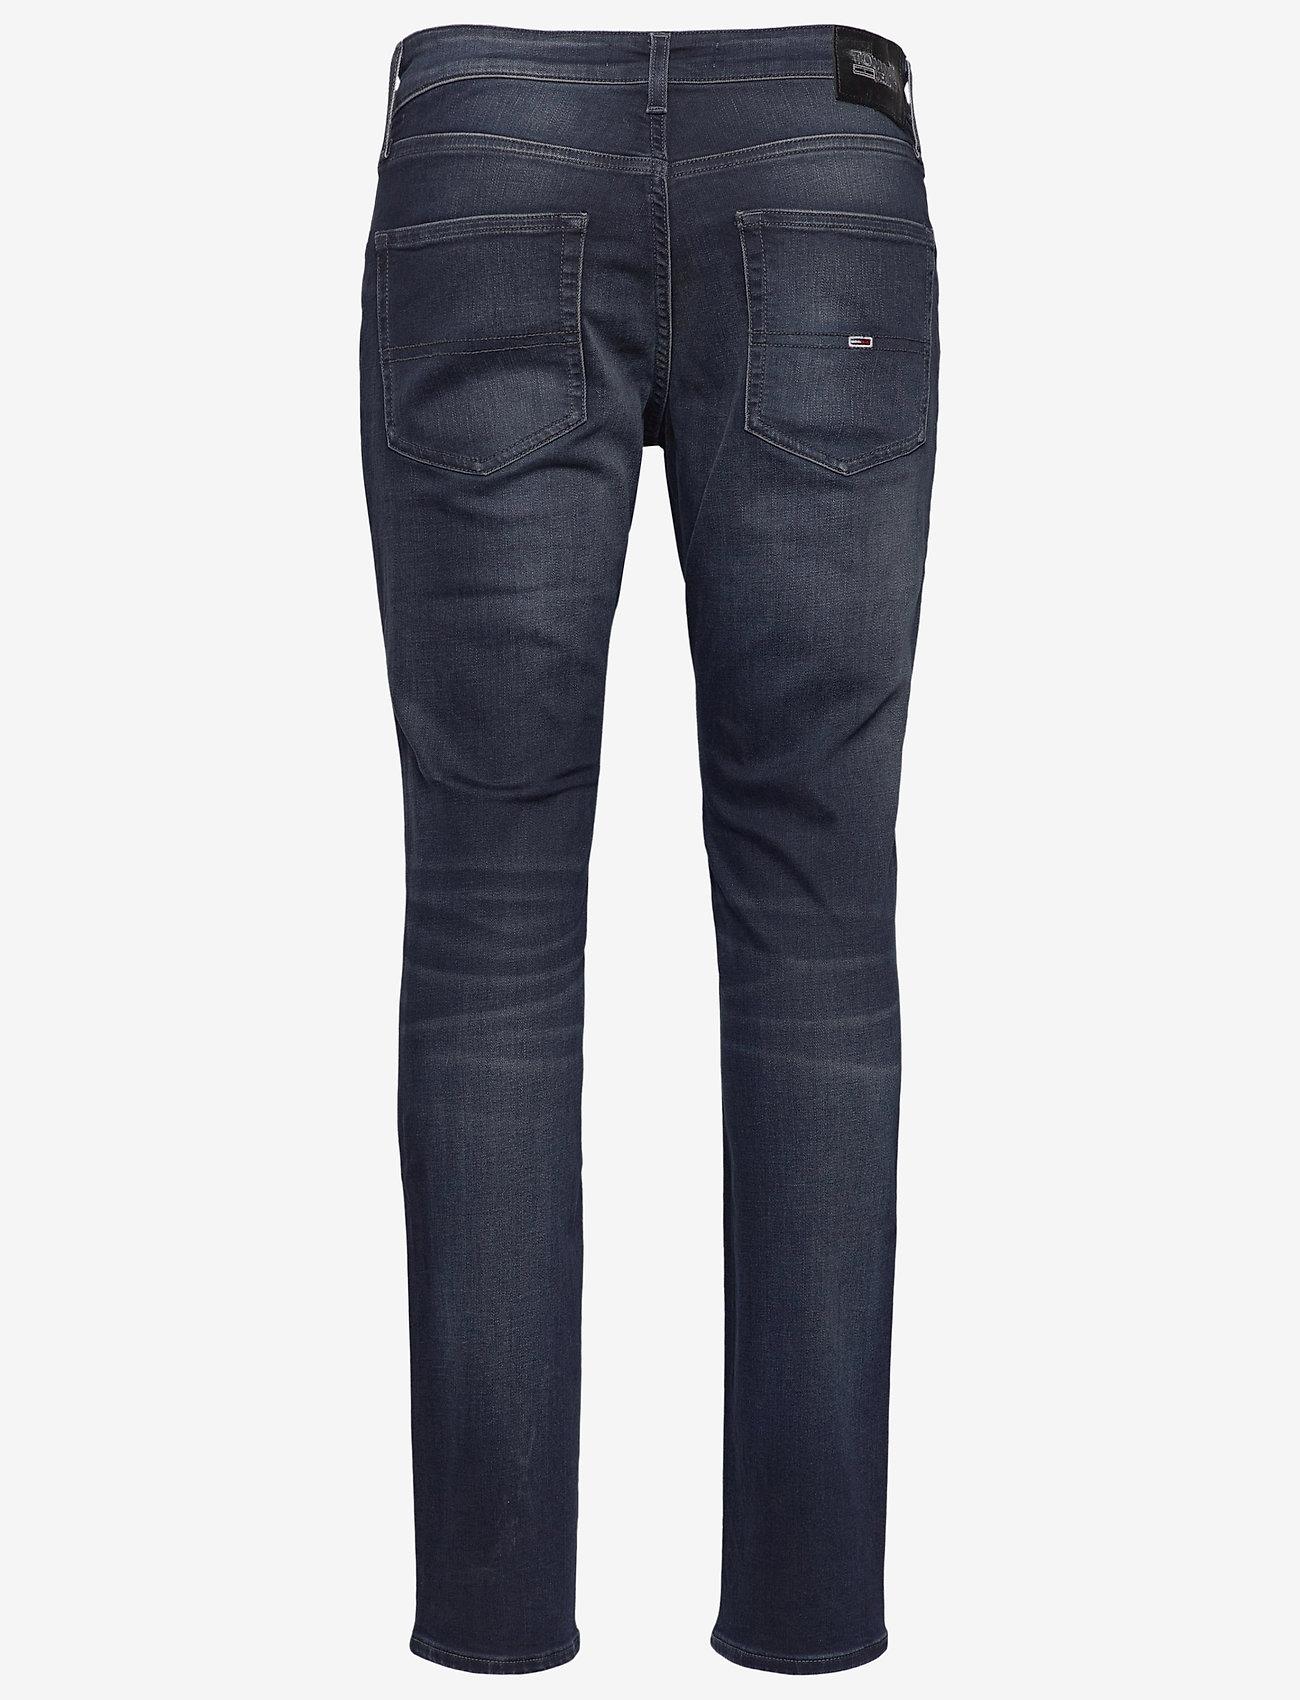 Tommy Jeans - SCANTON SLIM COBBS - slim jeans - cornell bl bk str - 1